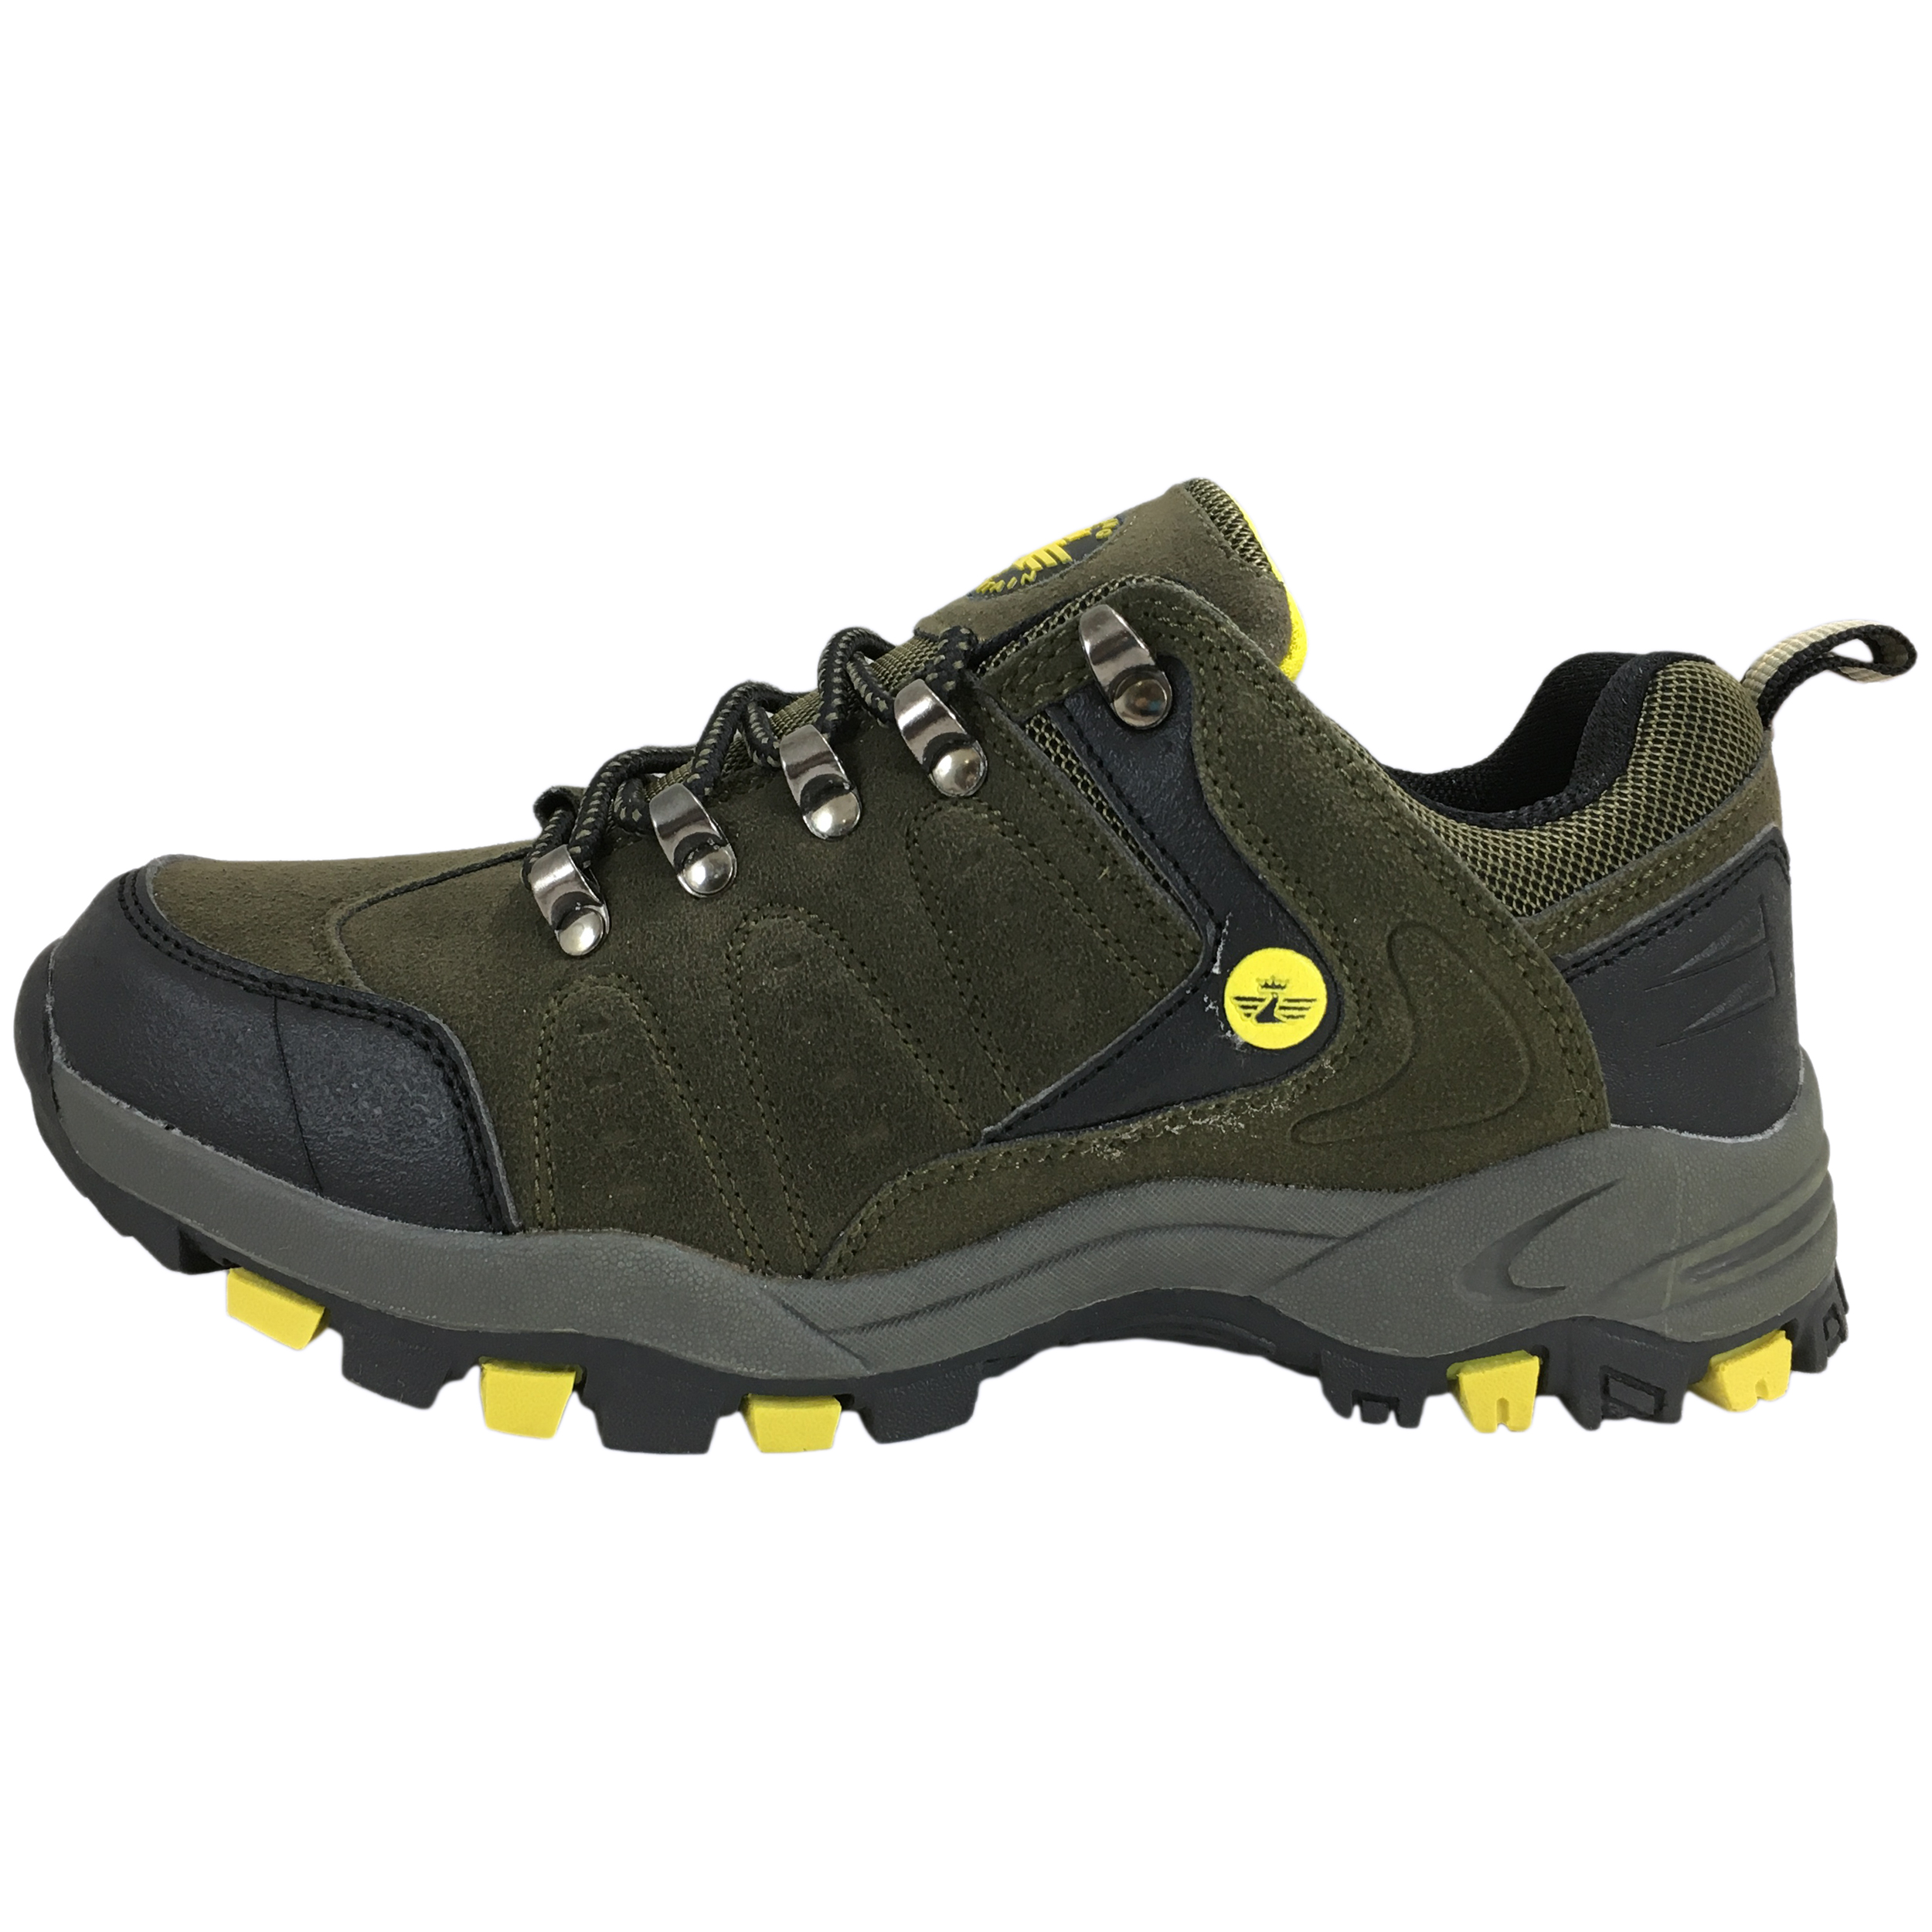 کفش کوهنوردی مردانه شنگ وین مدل هایکینگ کد A117